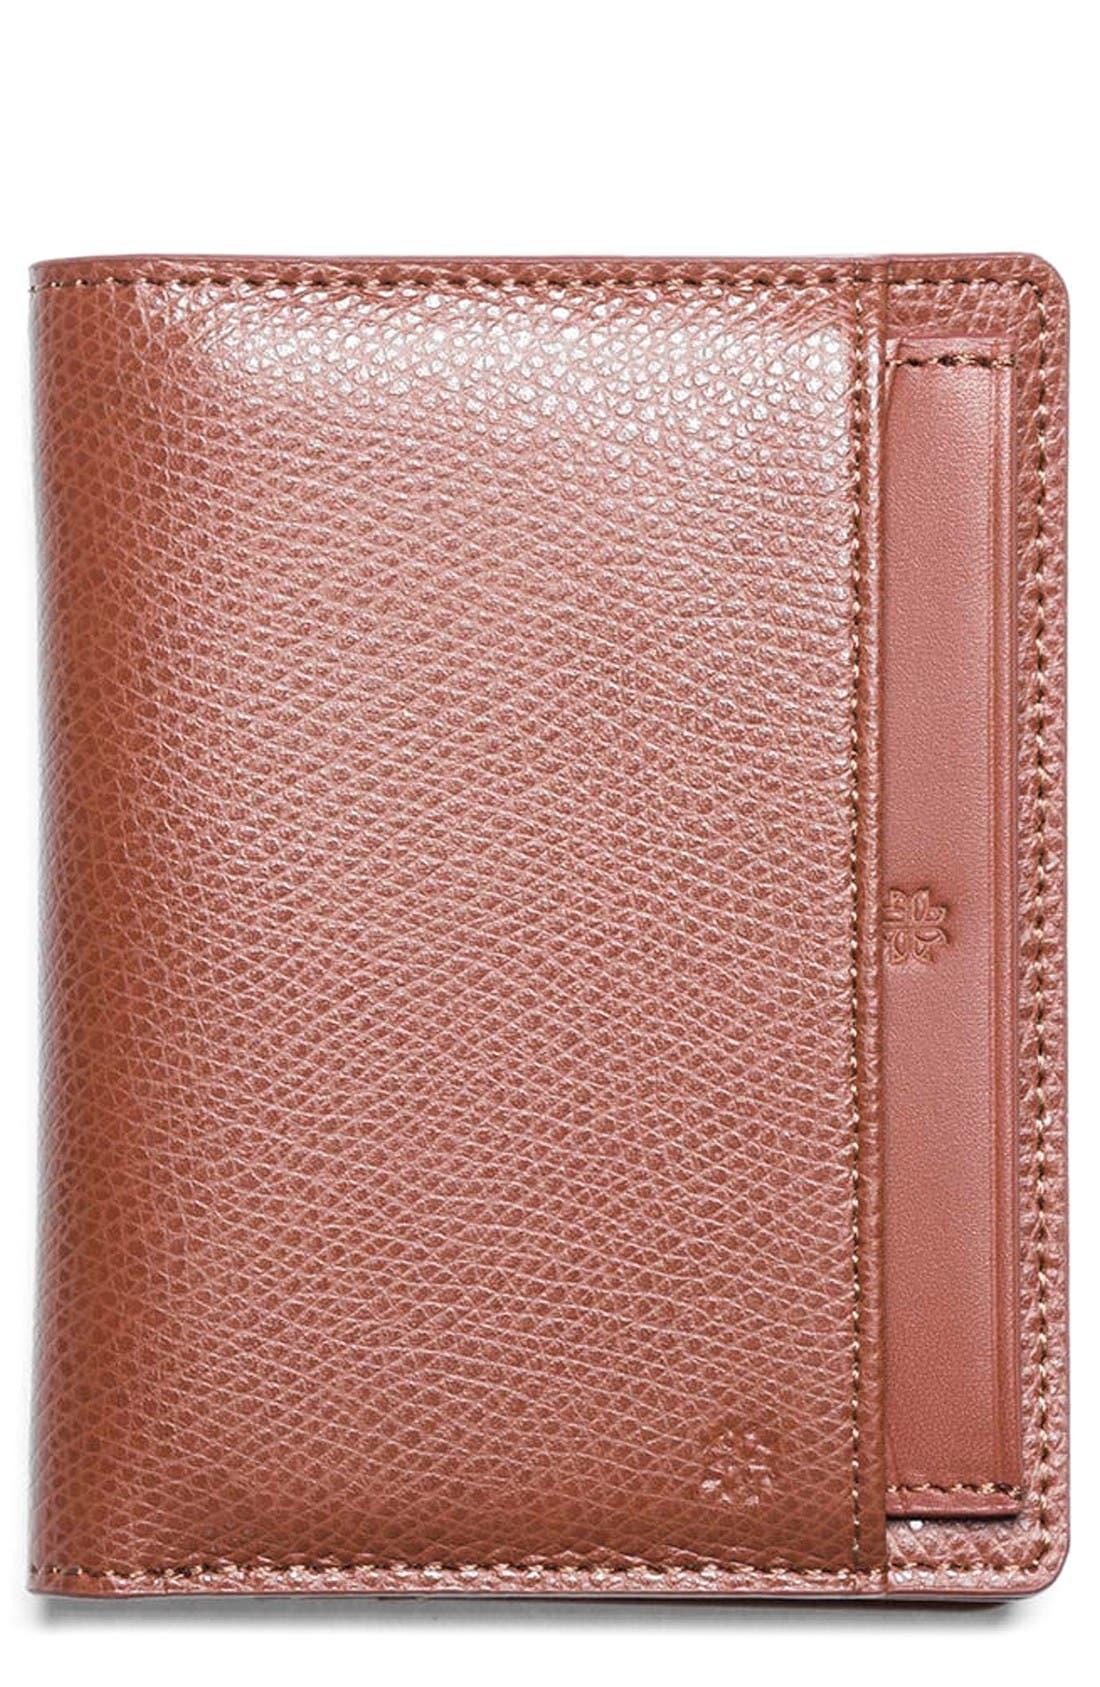 Hook + Albert Leather Bifold Wallet